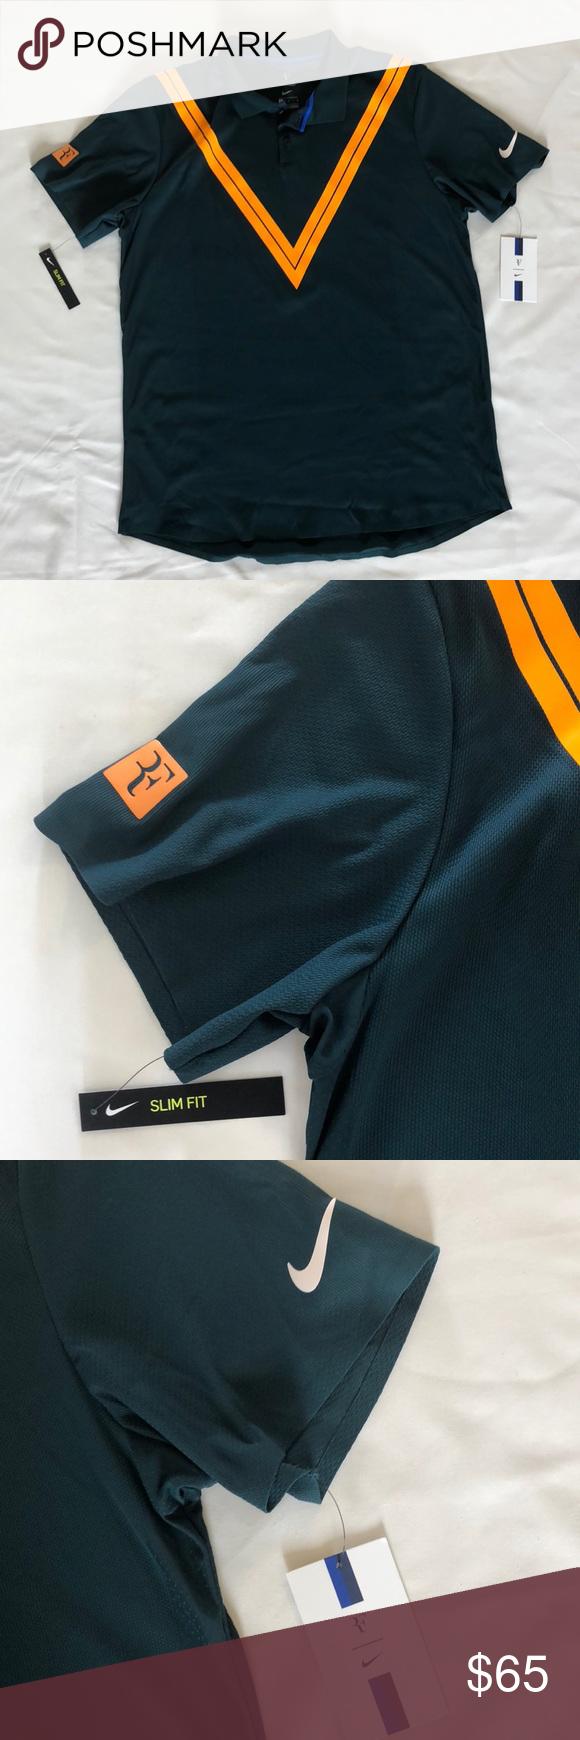 Nike Court Advantage Tennis Polo Roger Federer Nike Shirts Roger Federer Nike